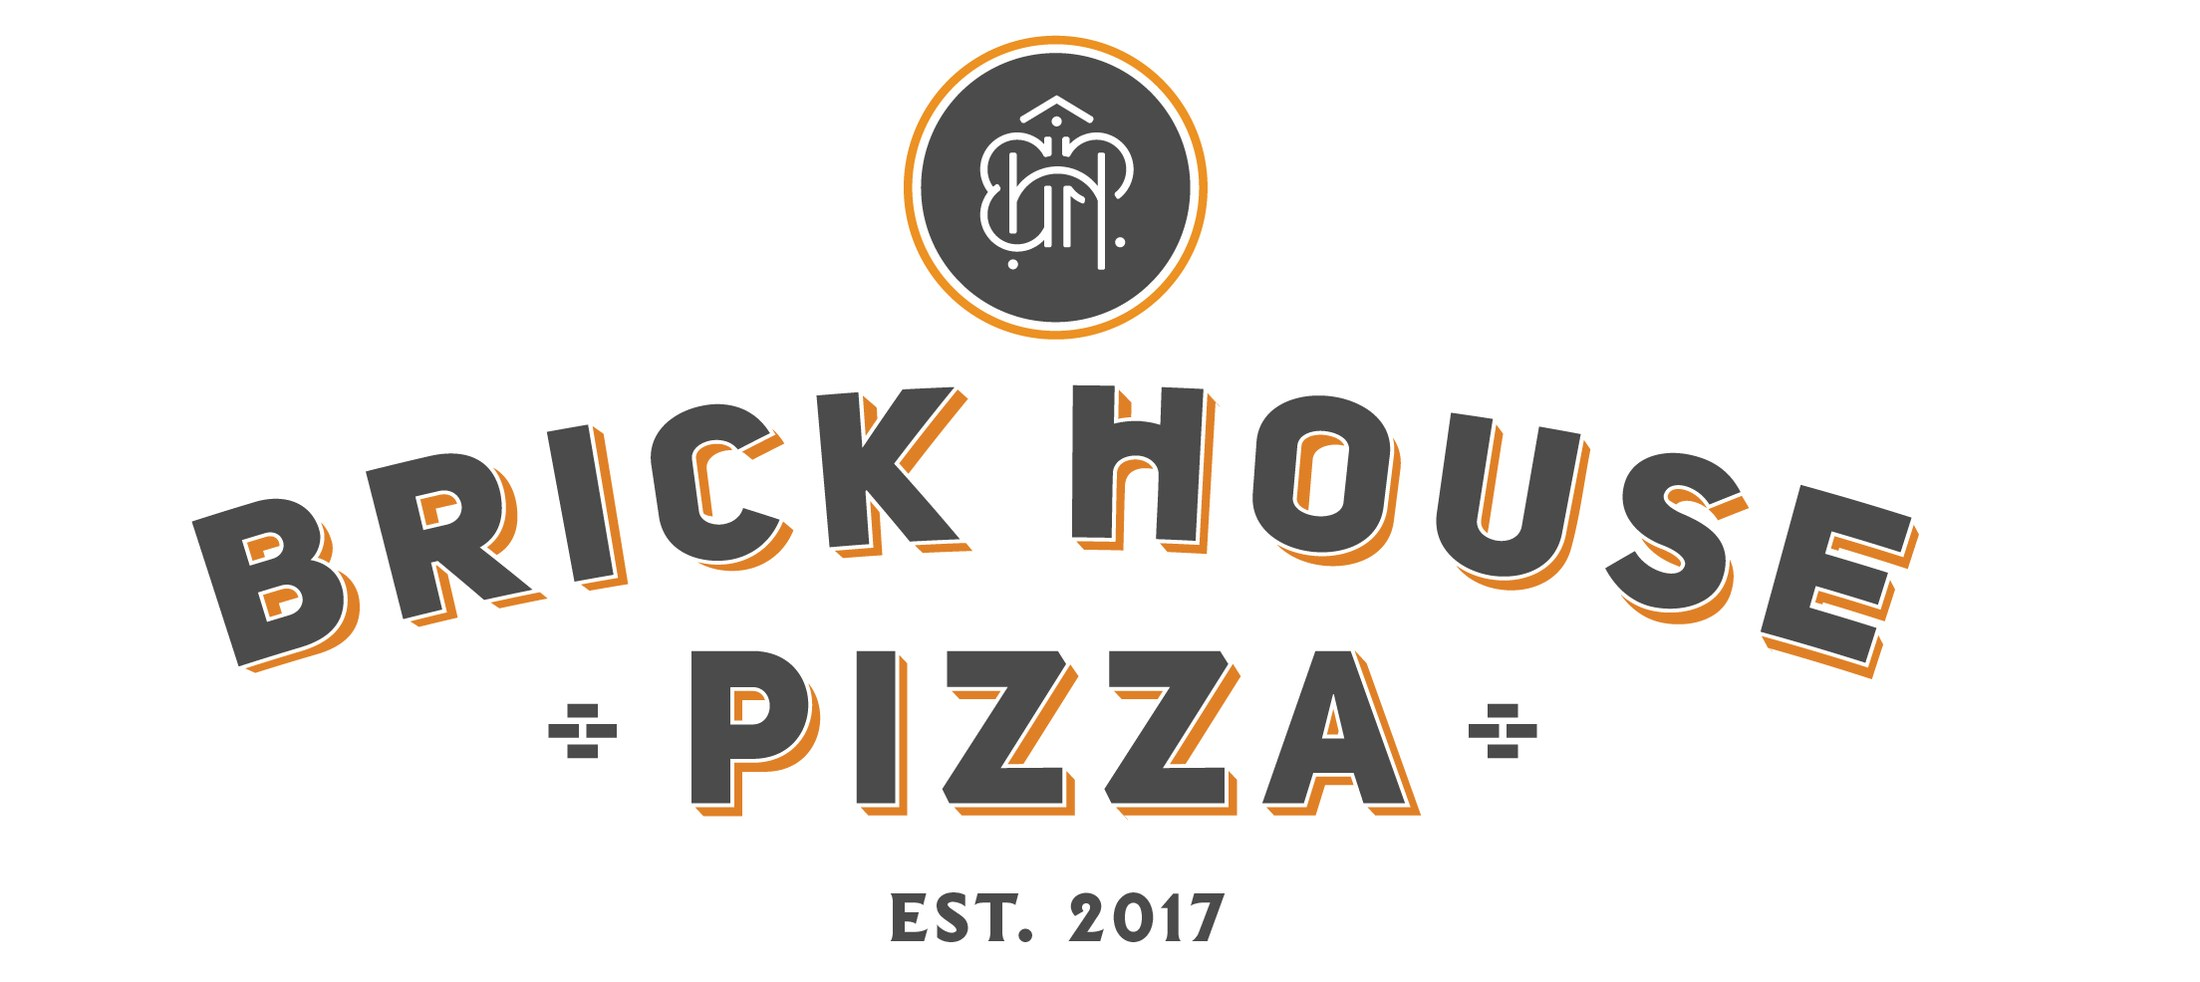 Brick House Pizza in Radford